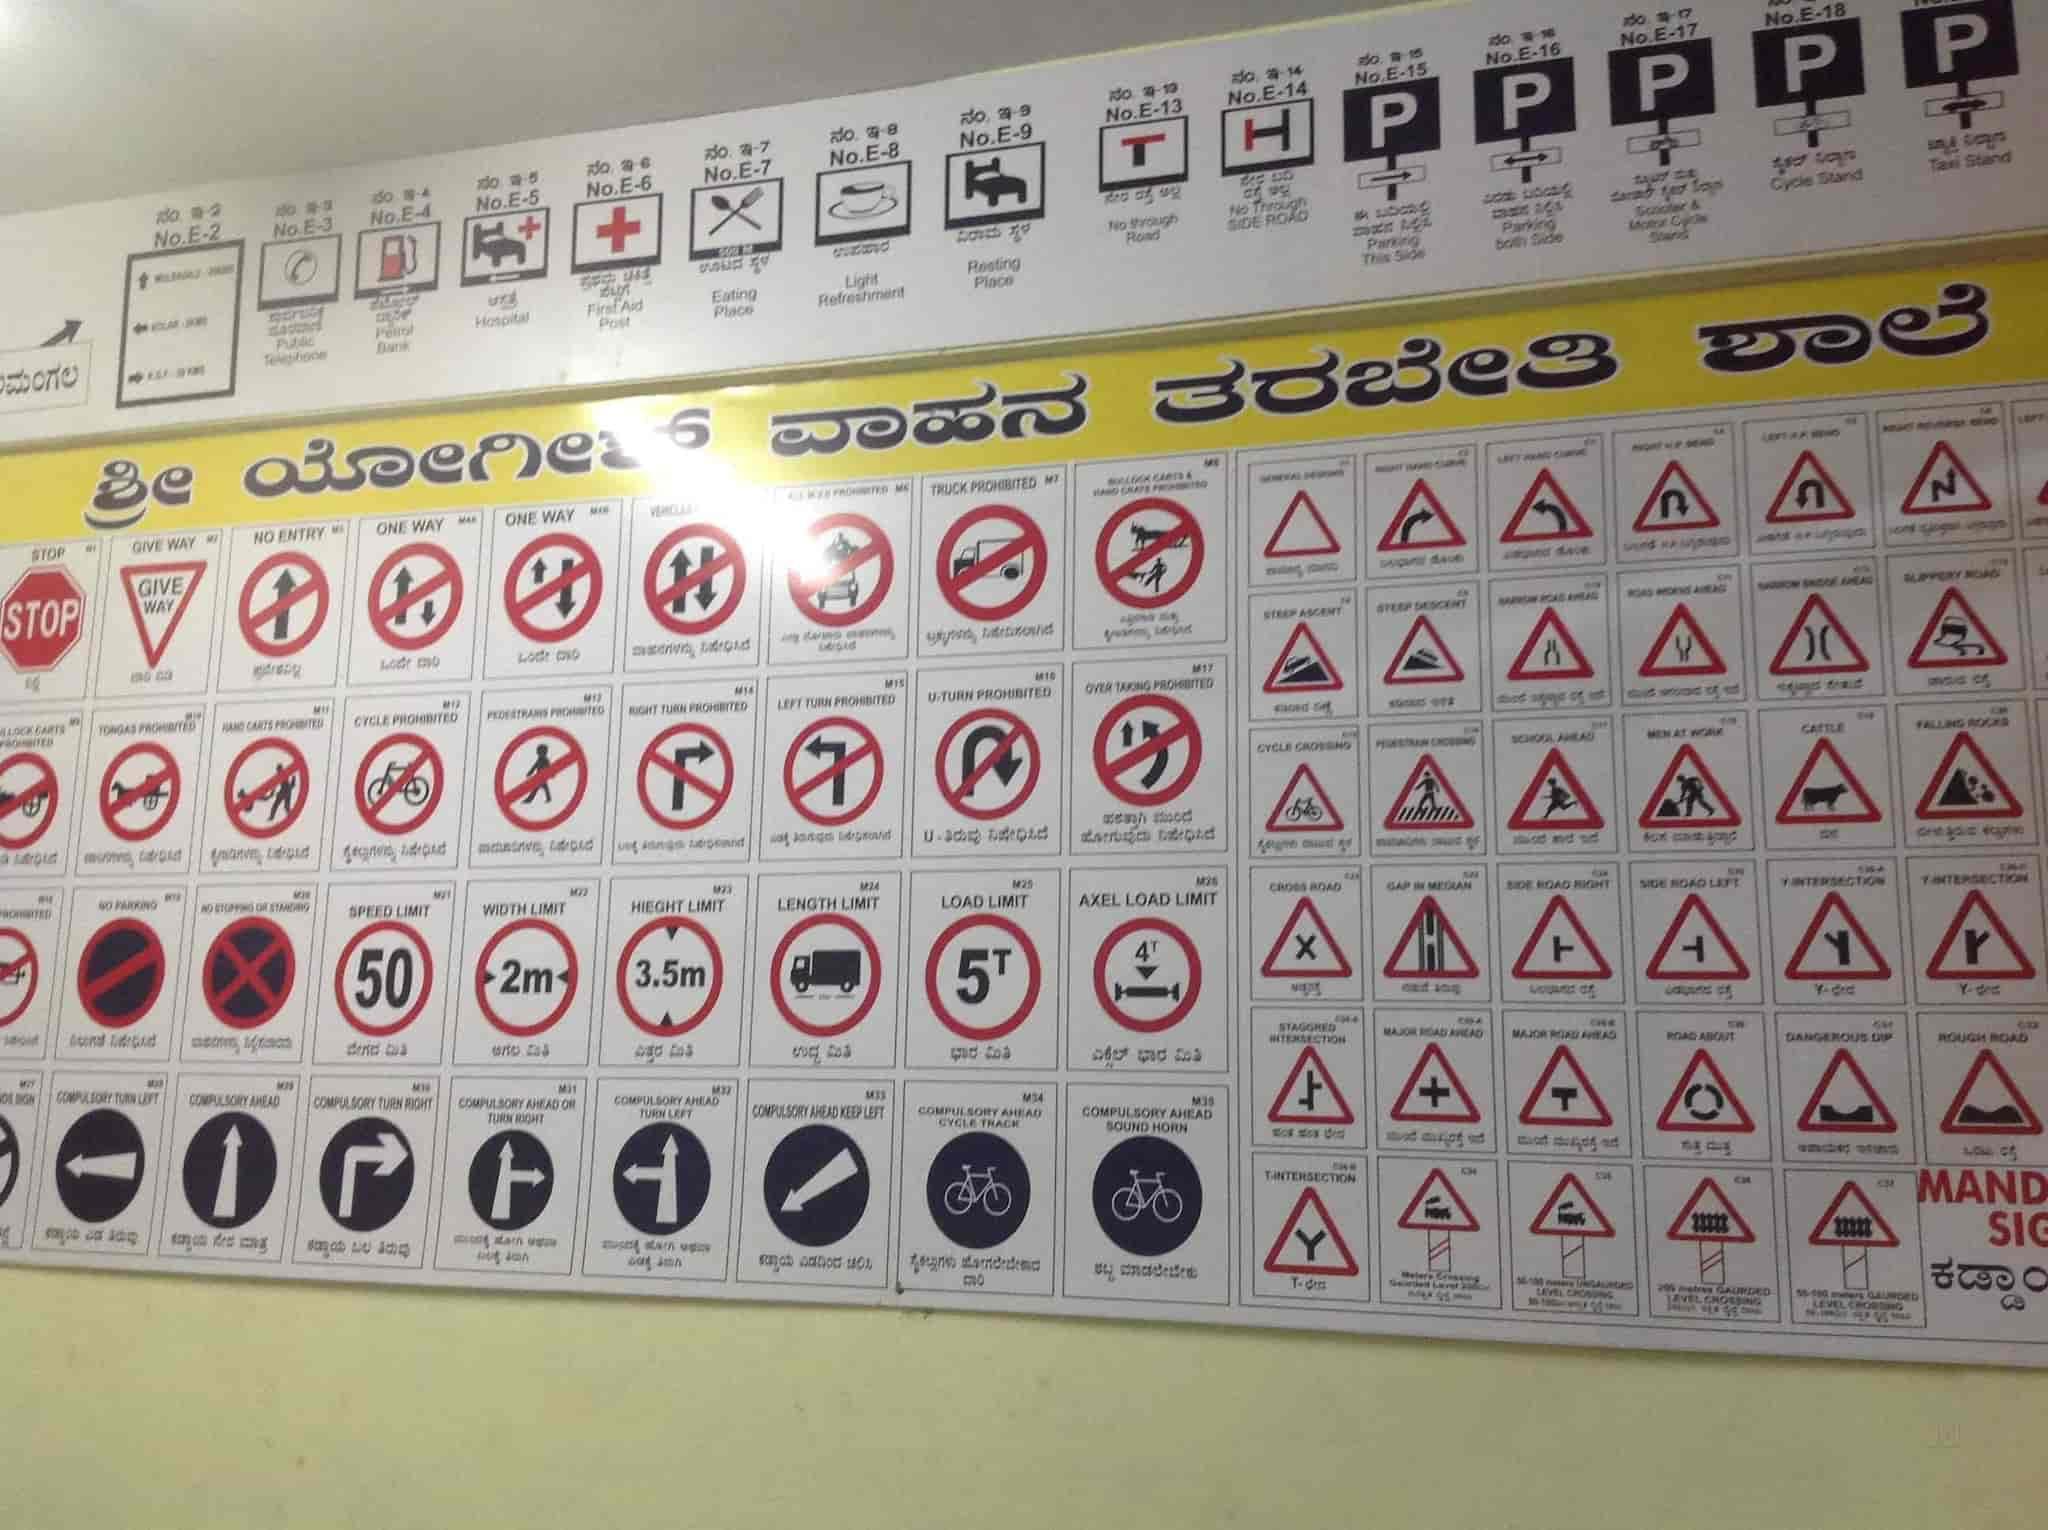 Yogesh Driving School Reviews, Chandra Layout, Bangalore - 3